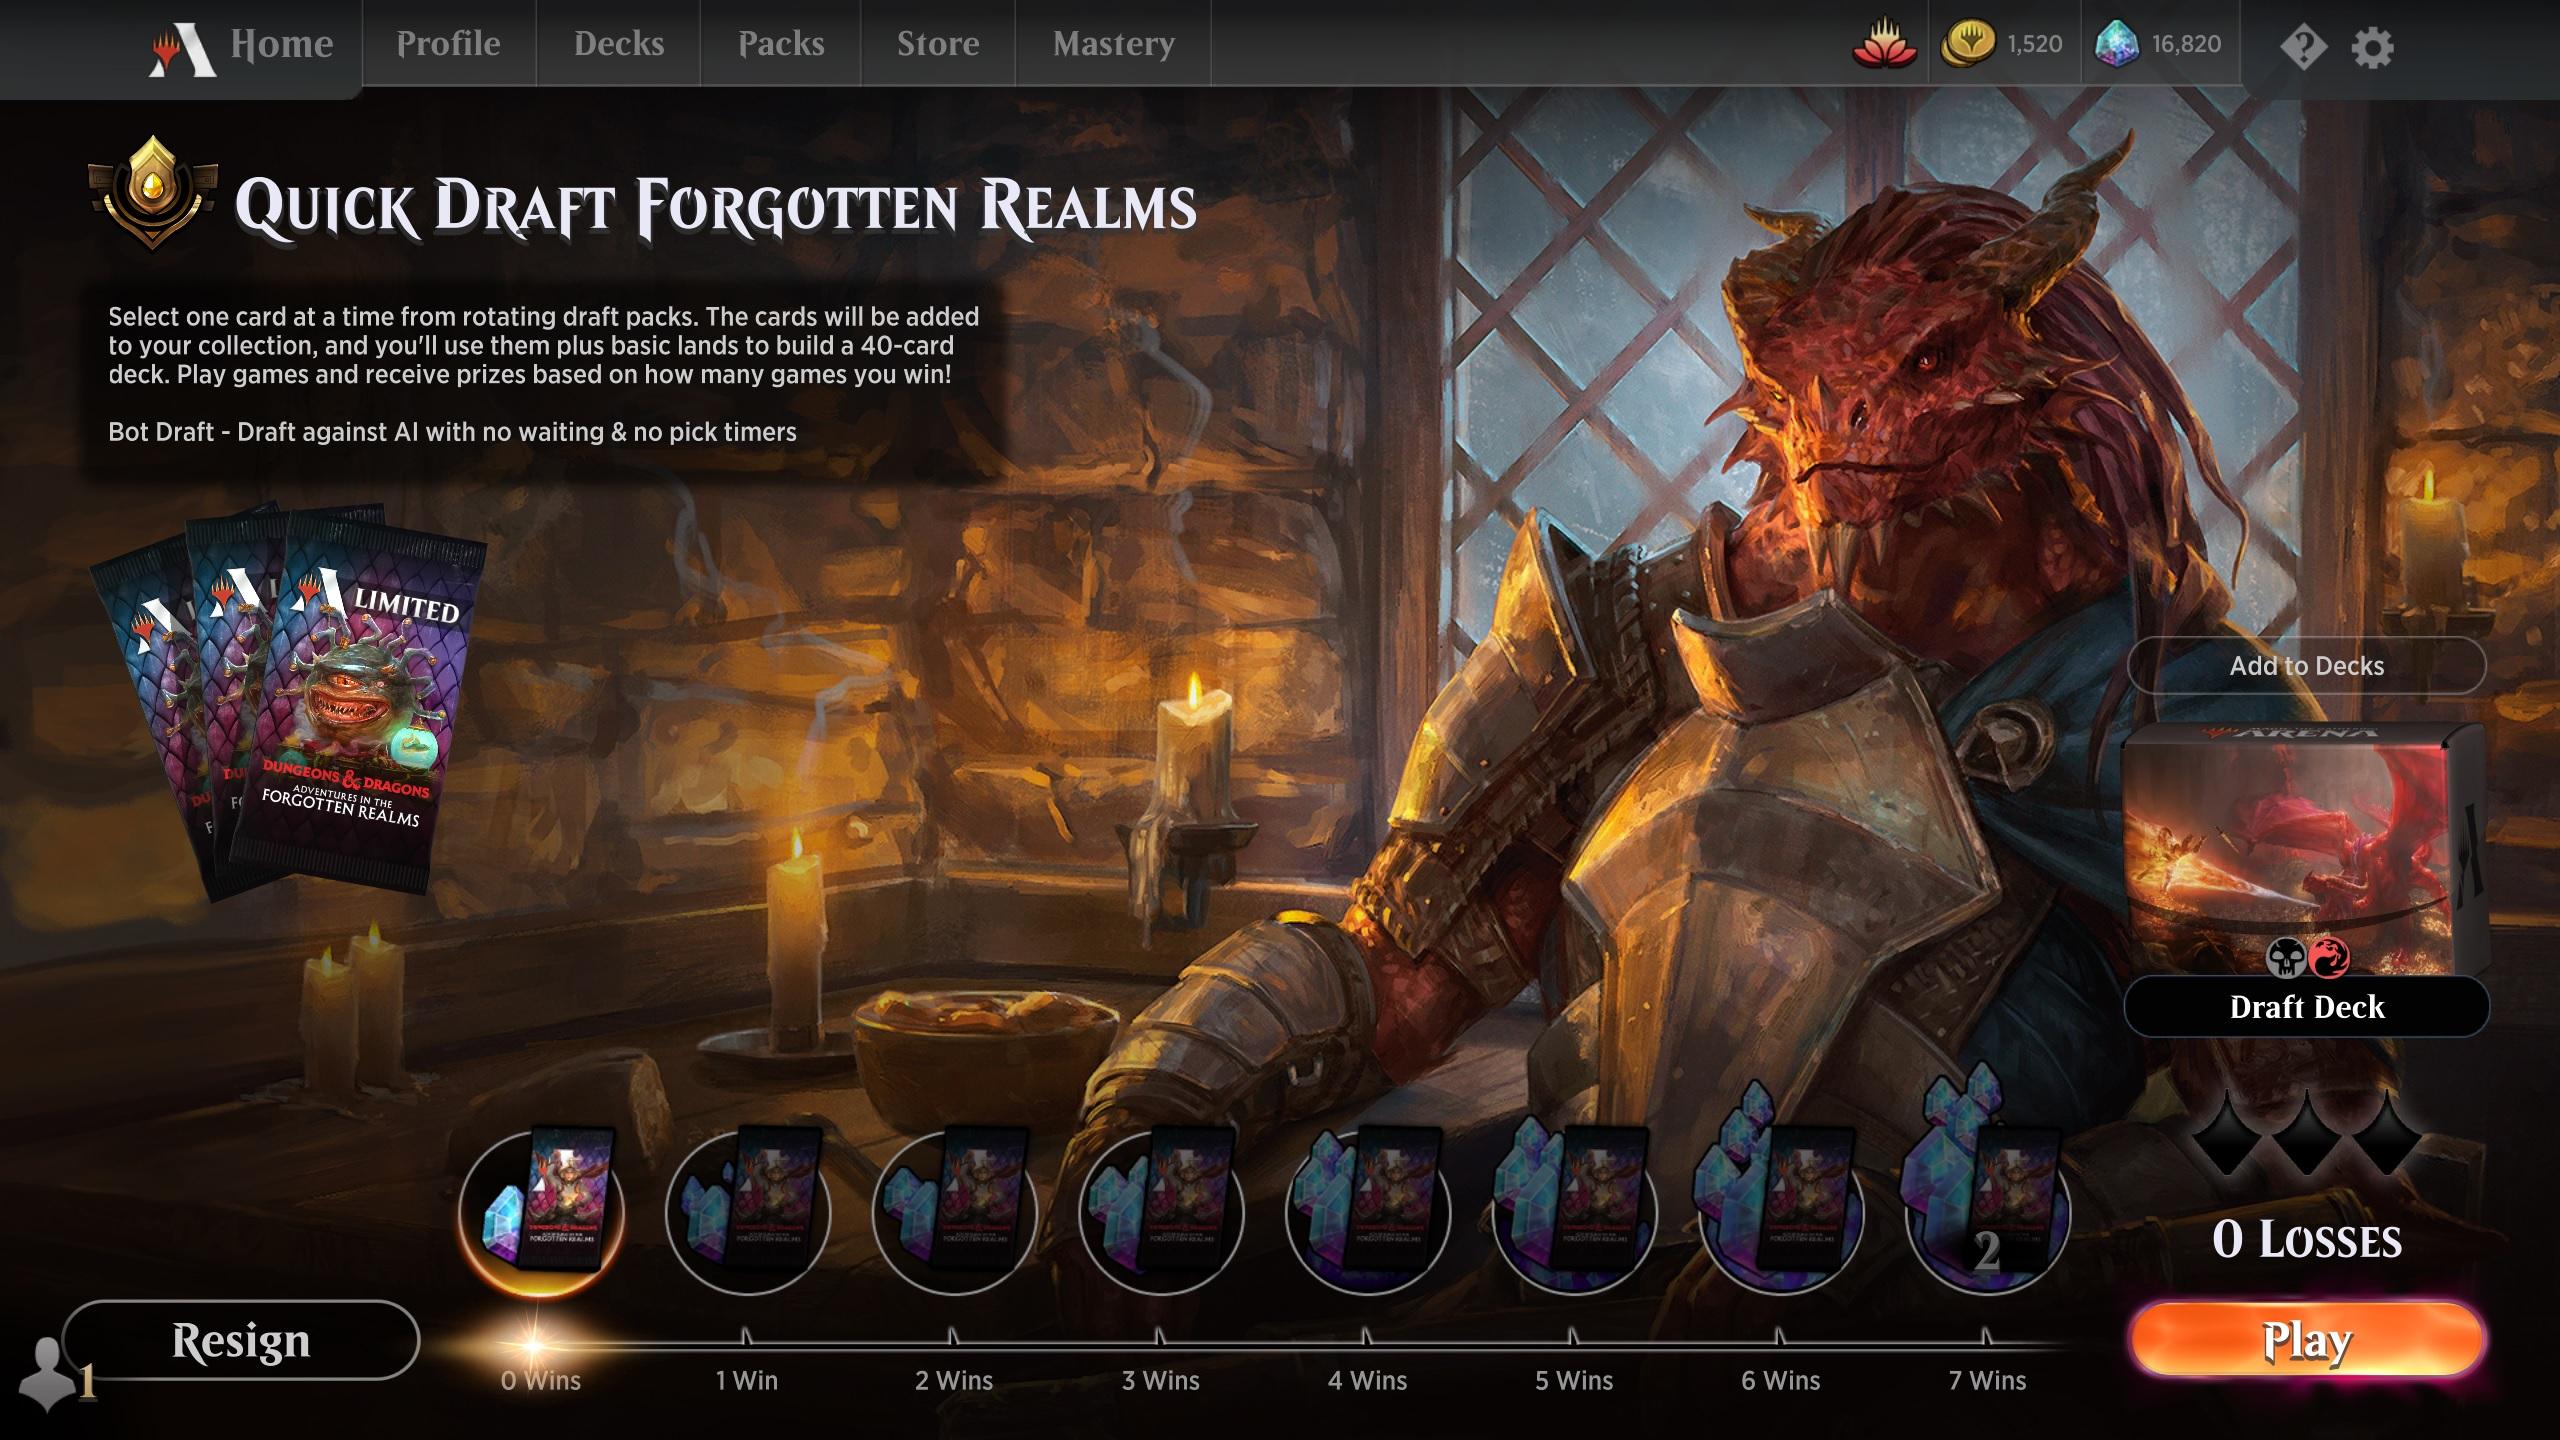 Quick Draft Forgotten Realms